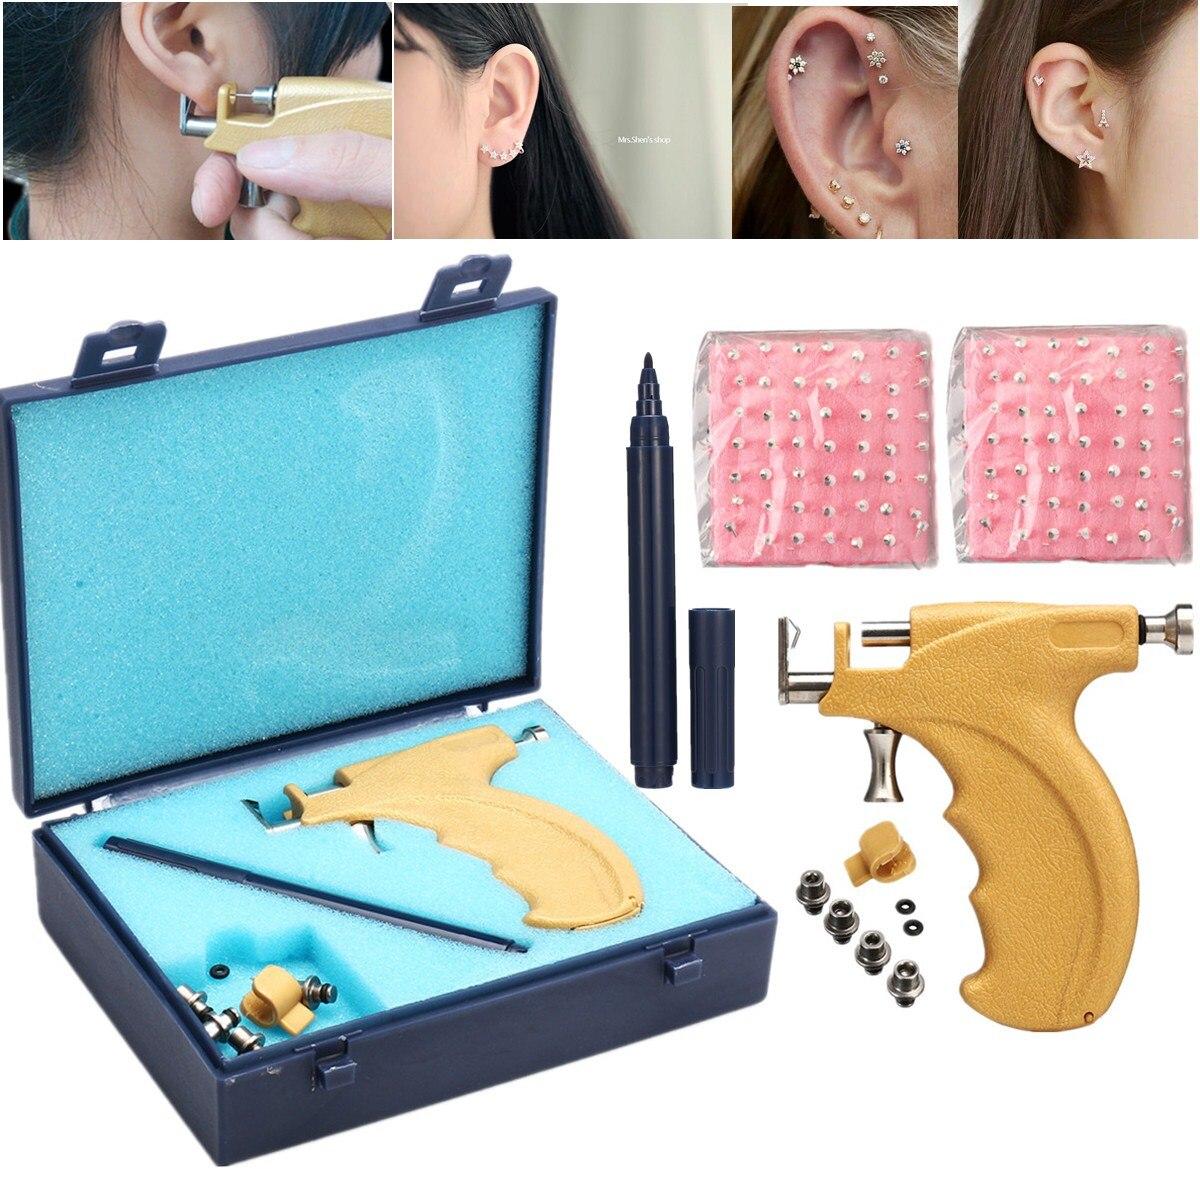 3mm/4mm/5mm Professional Ear Stud Earring Piercing Machine Tools Kit Body Piercing Free Studs Set 2019 New